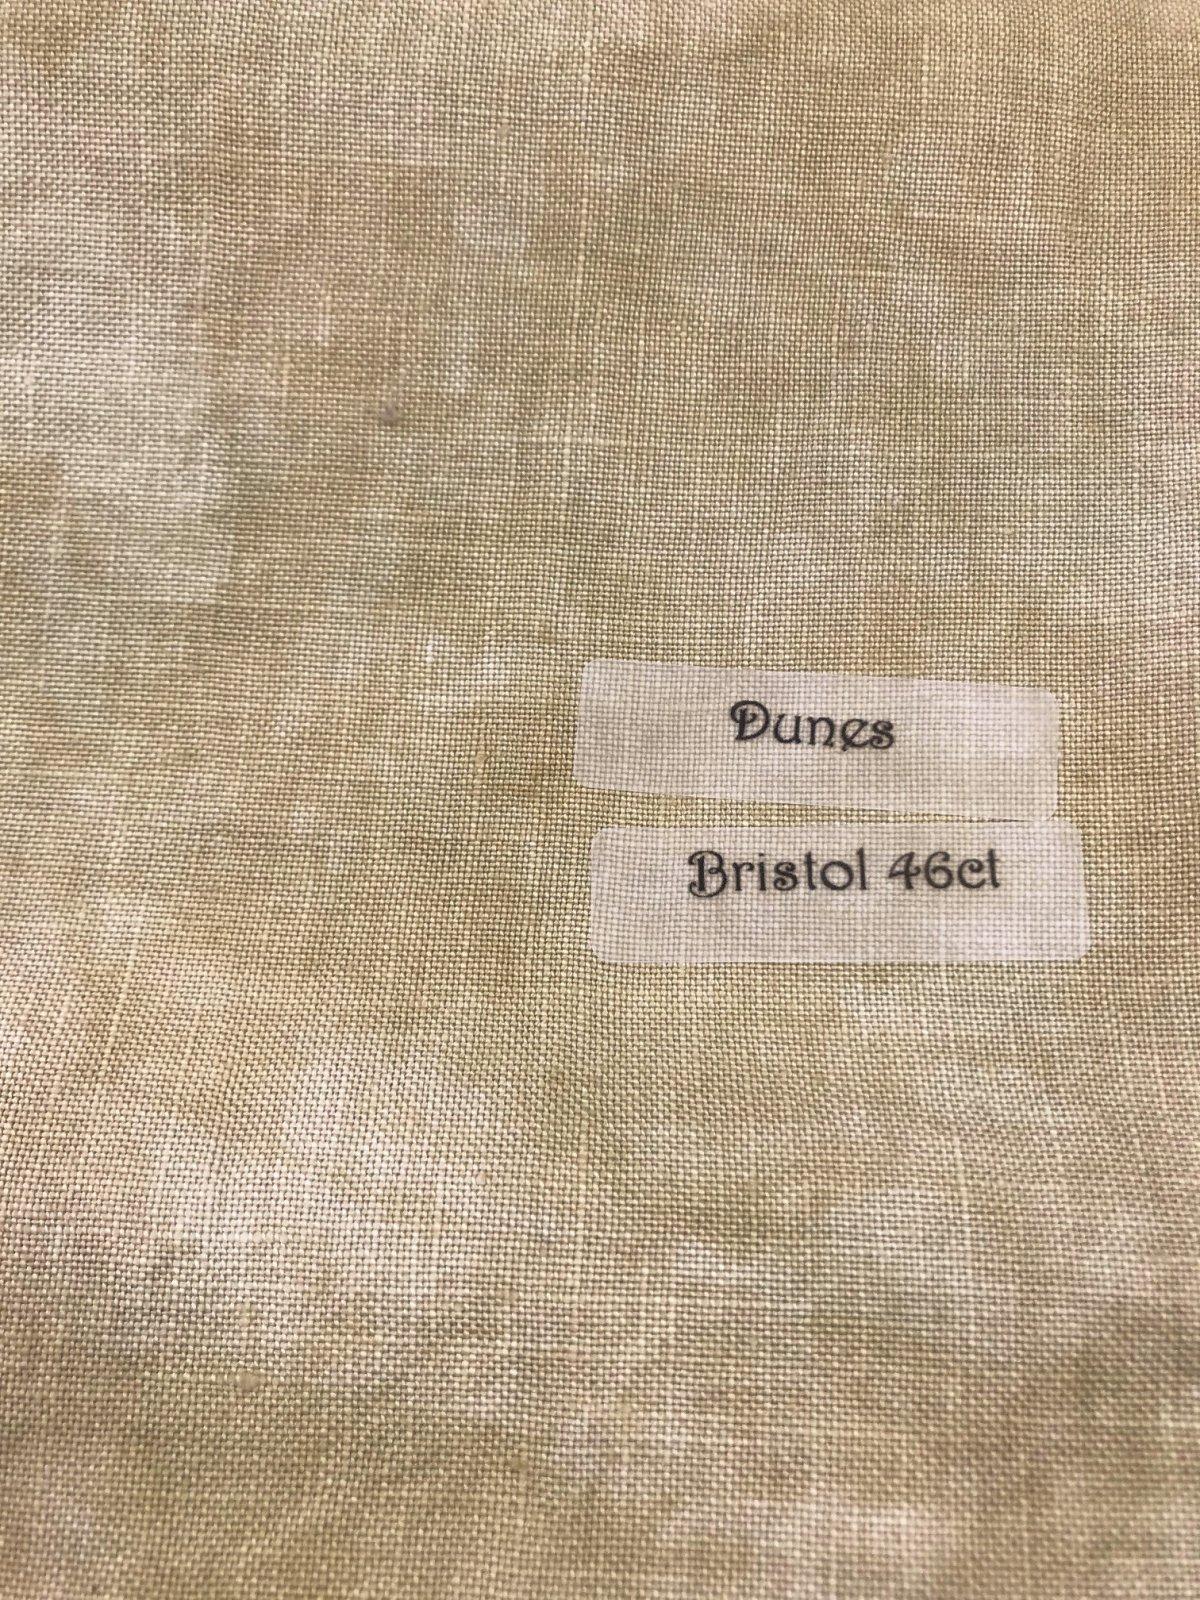 46 ct Dunes Bristol Fabric ~ FOW